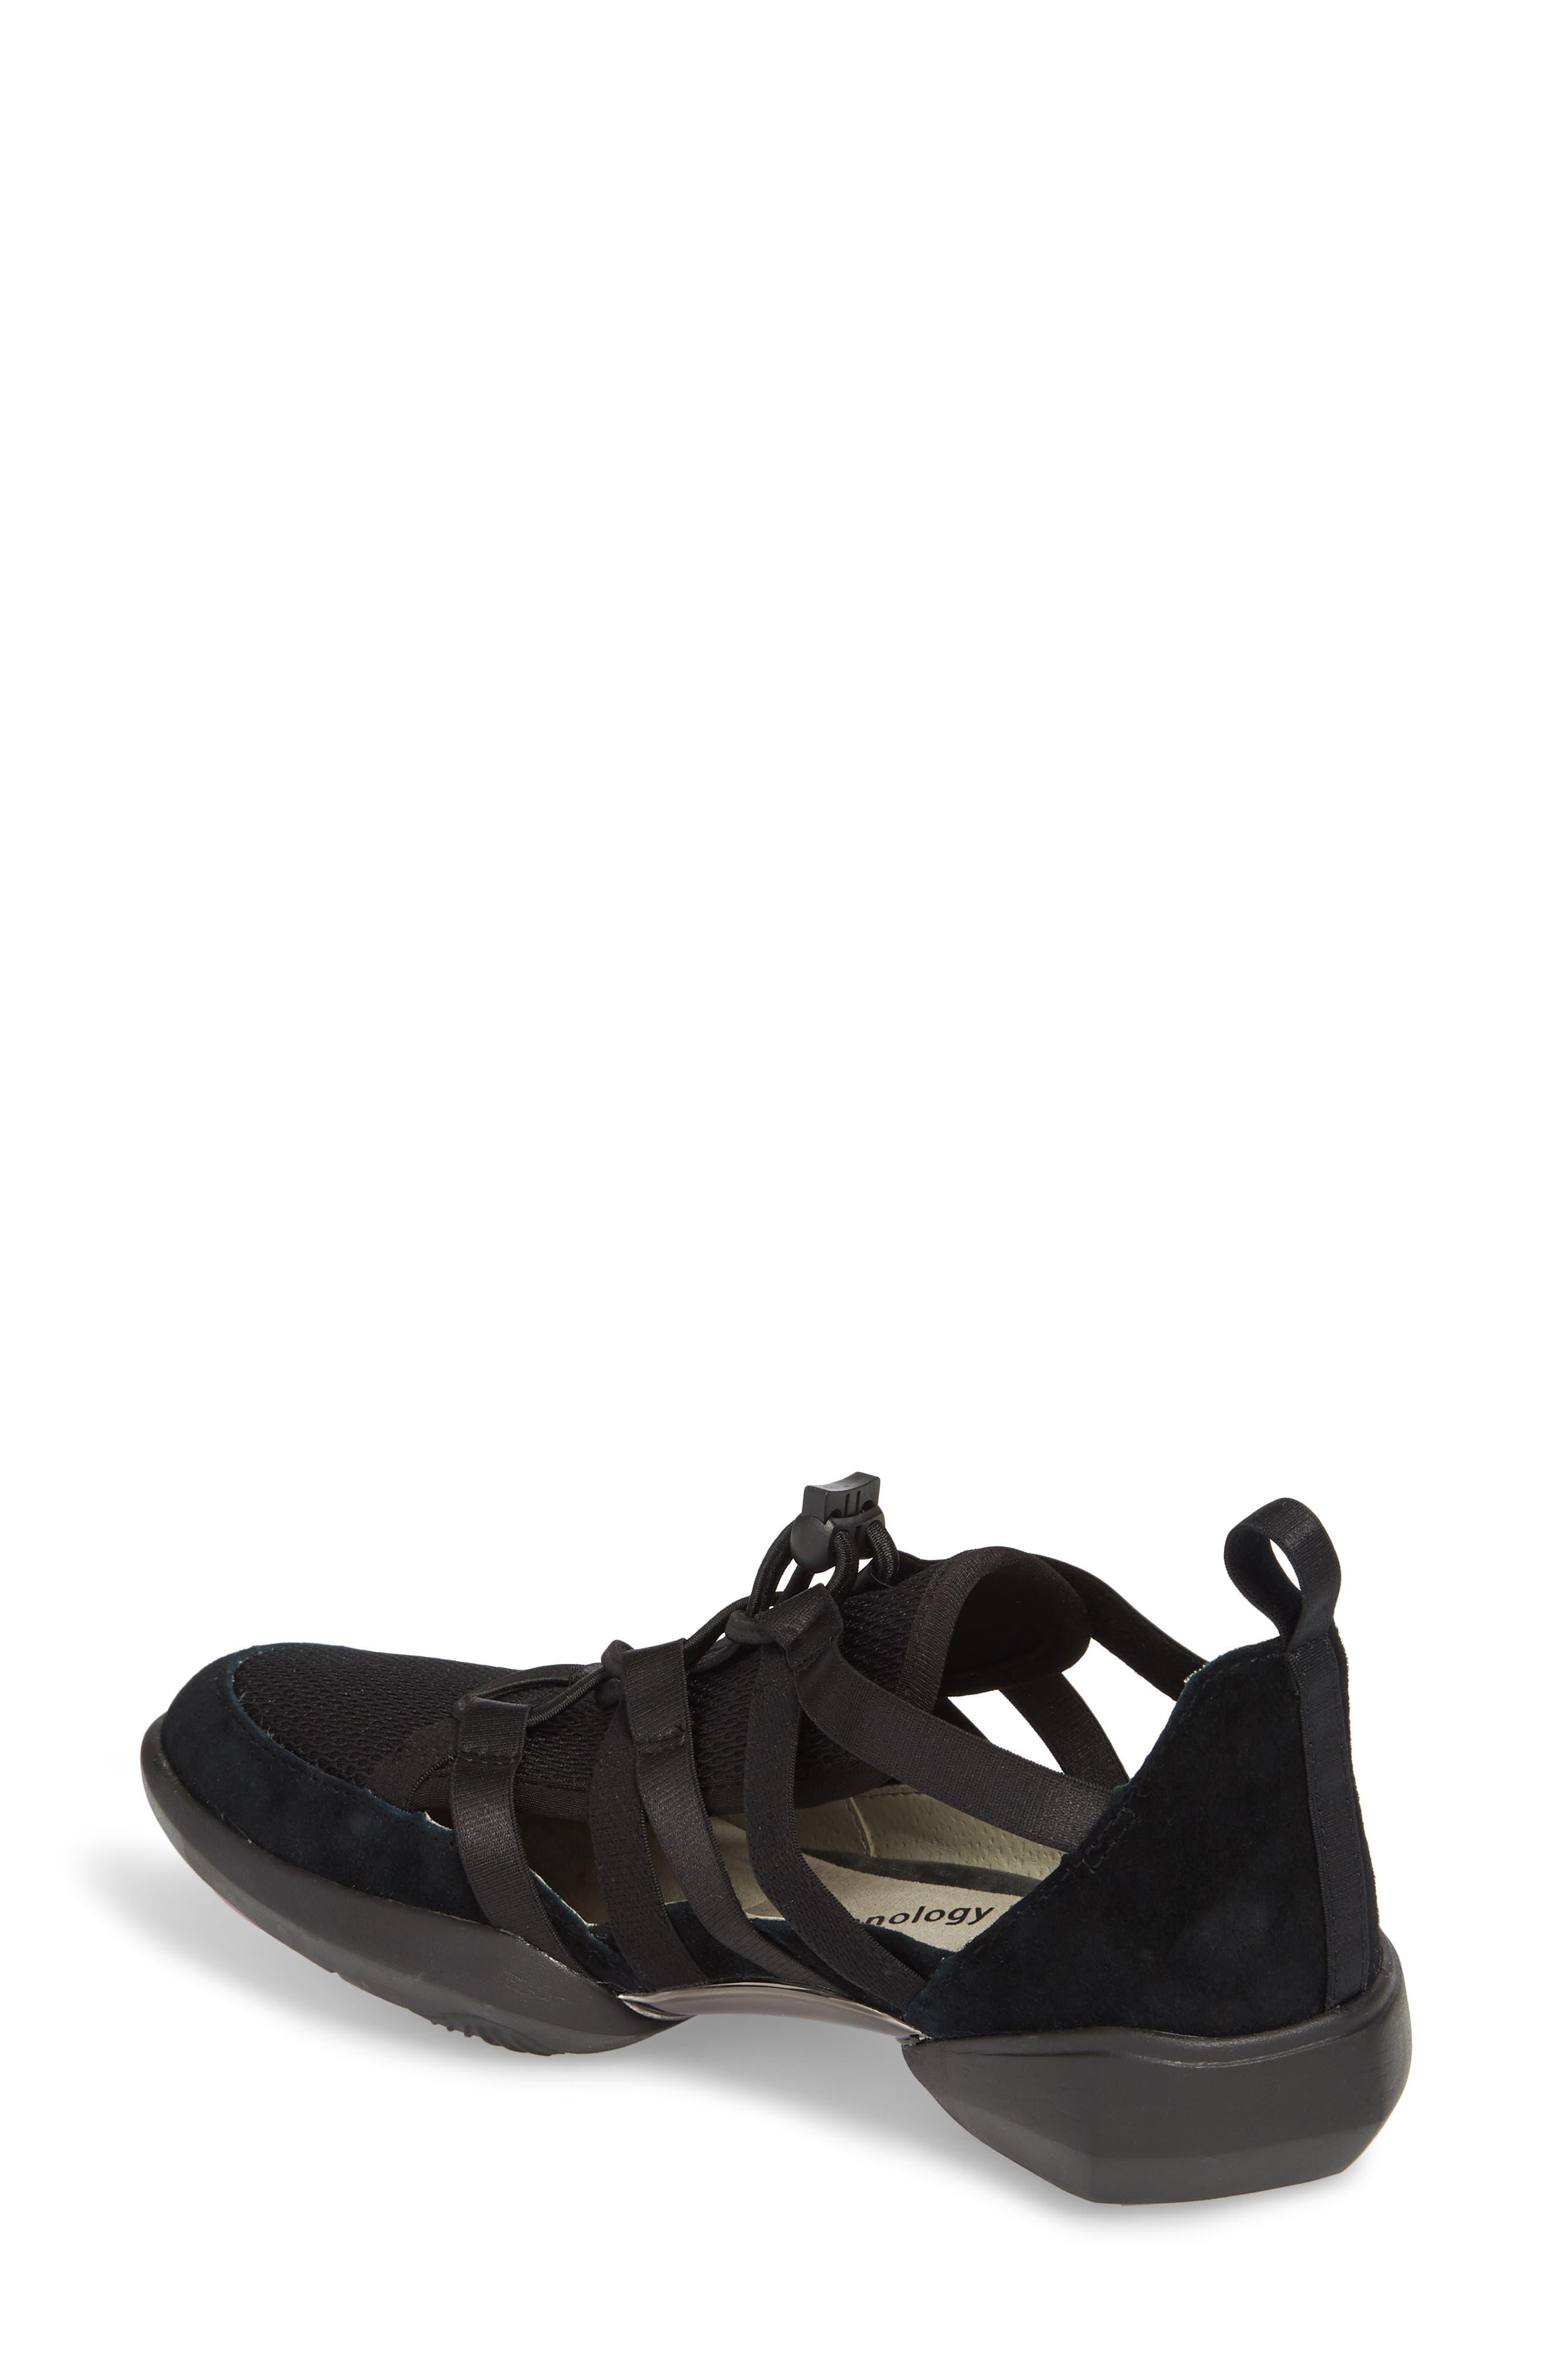 Azalea Sneaker,                             Alternate thumbnail 2, color,                             BLACK SUEDE